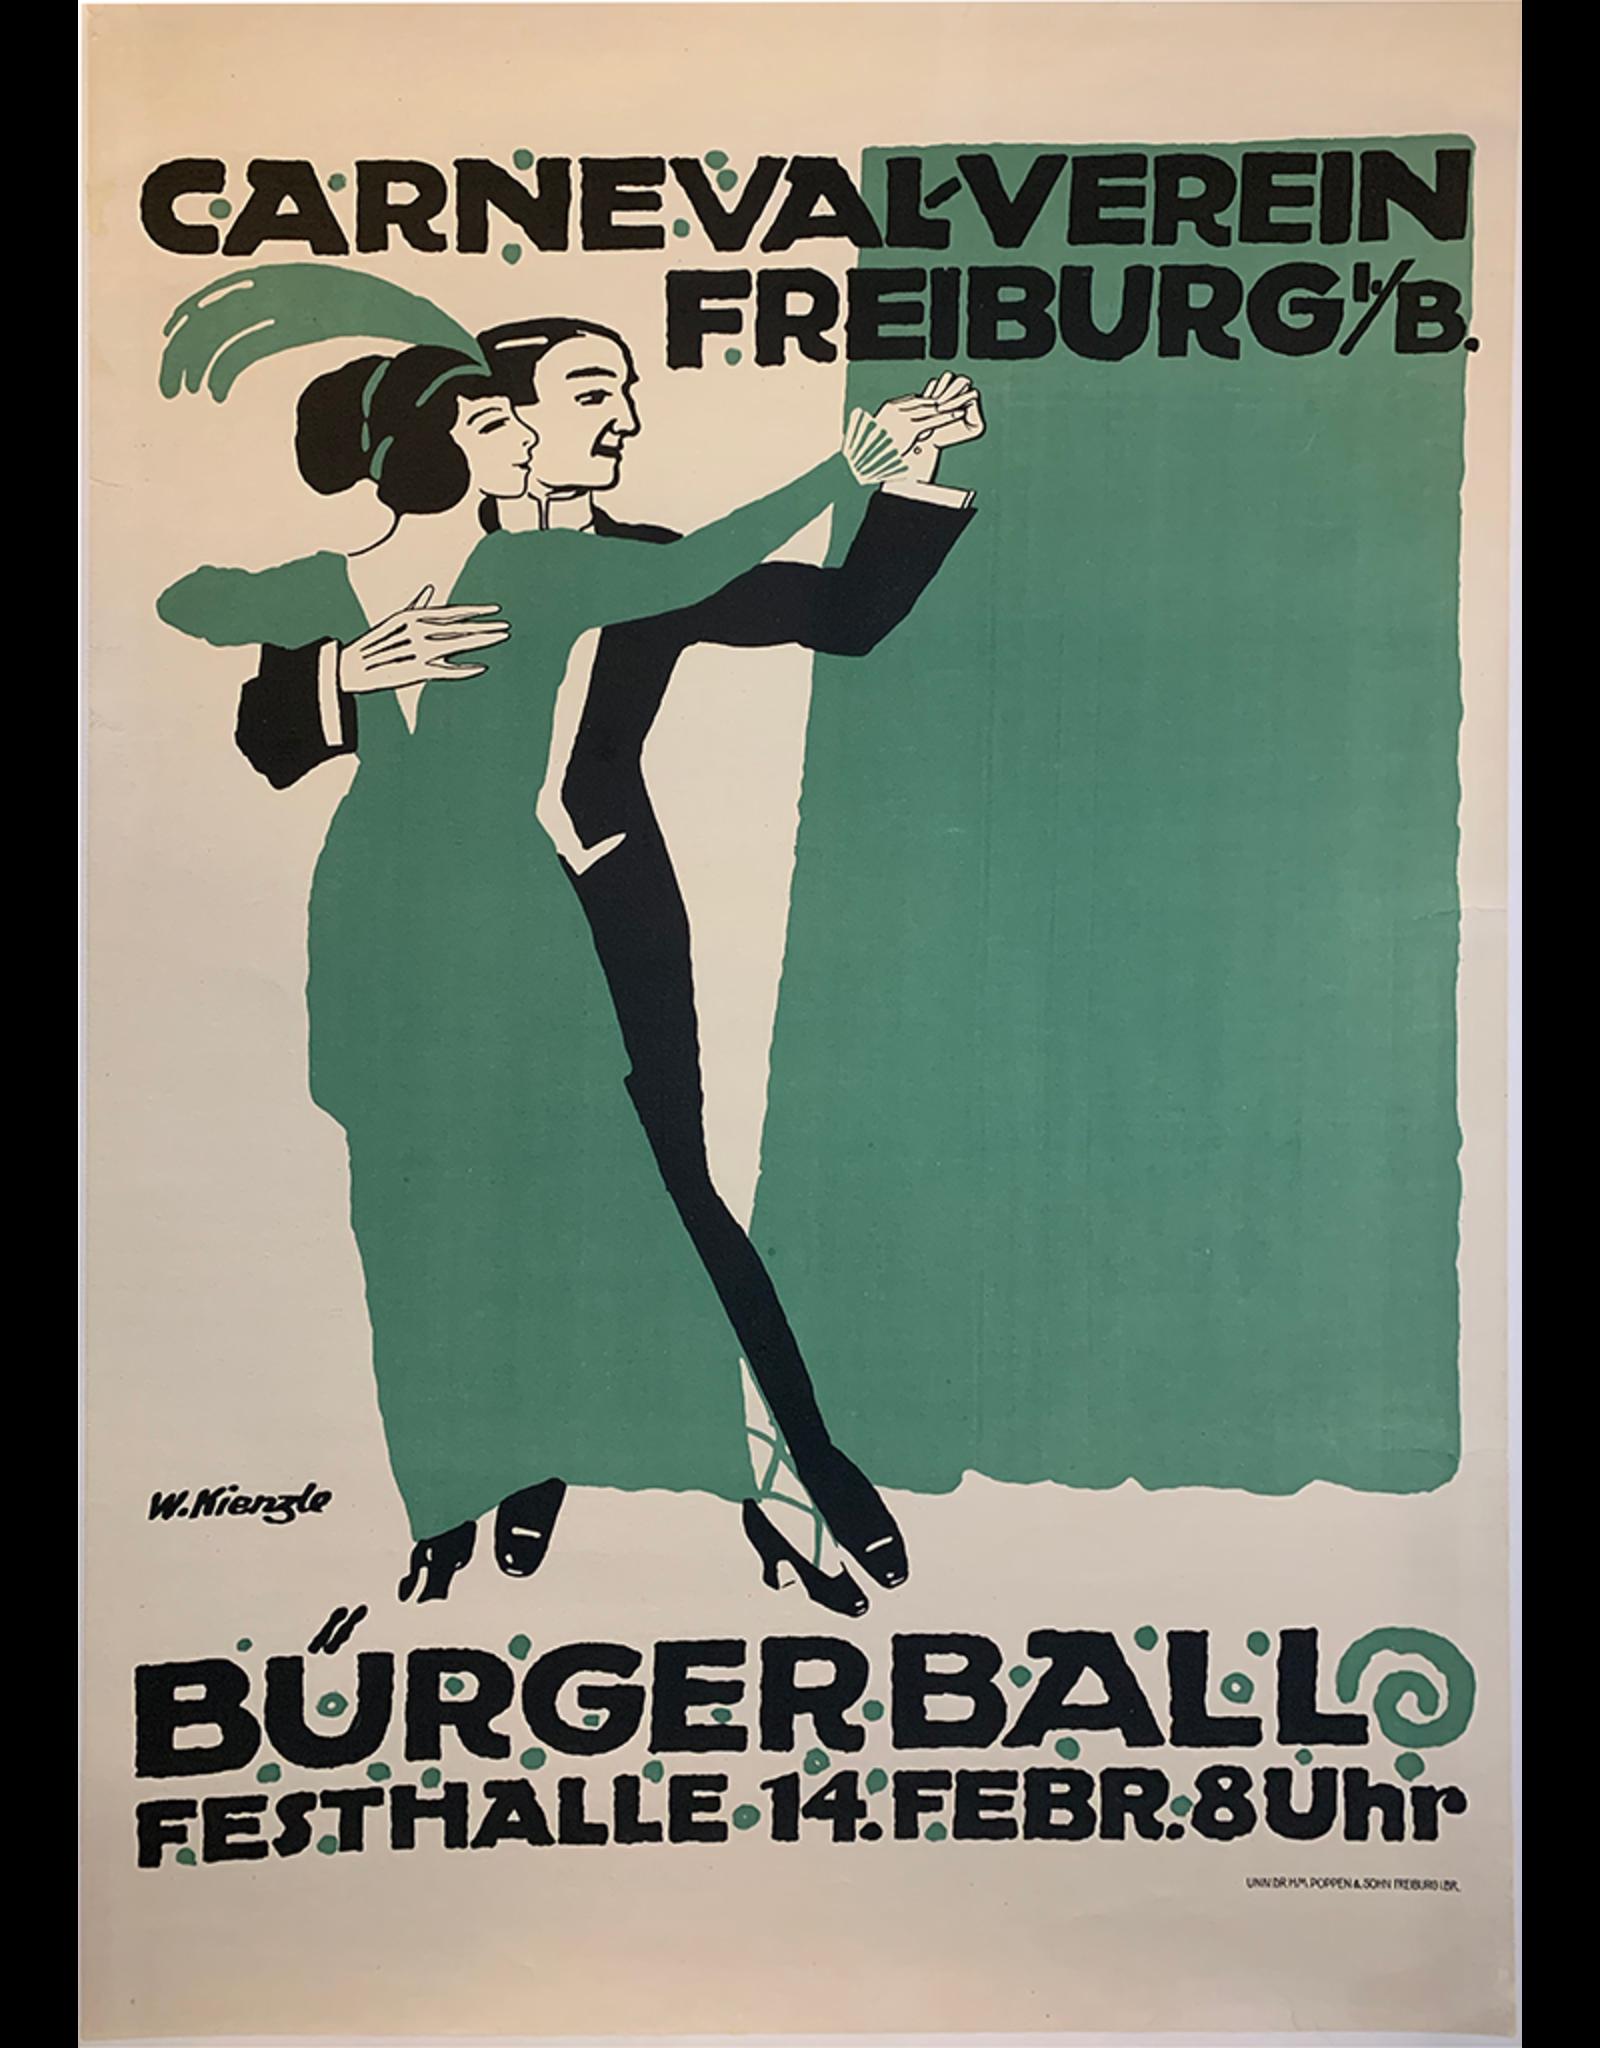 SPV Carneval-Verein_Freiburg